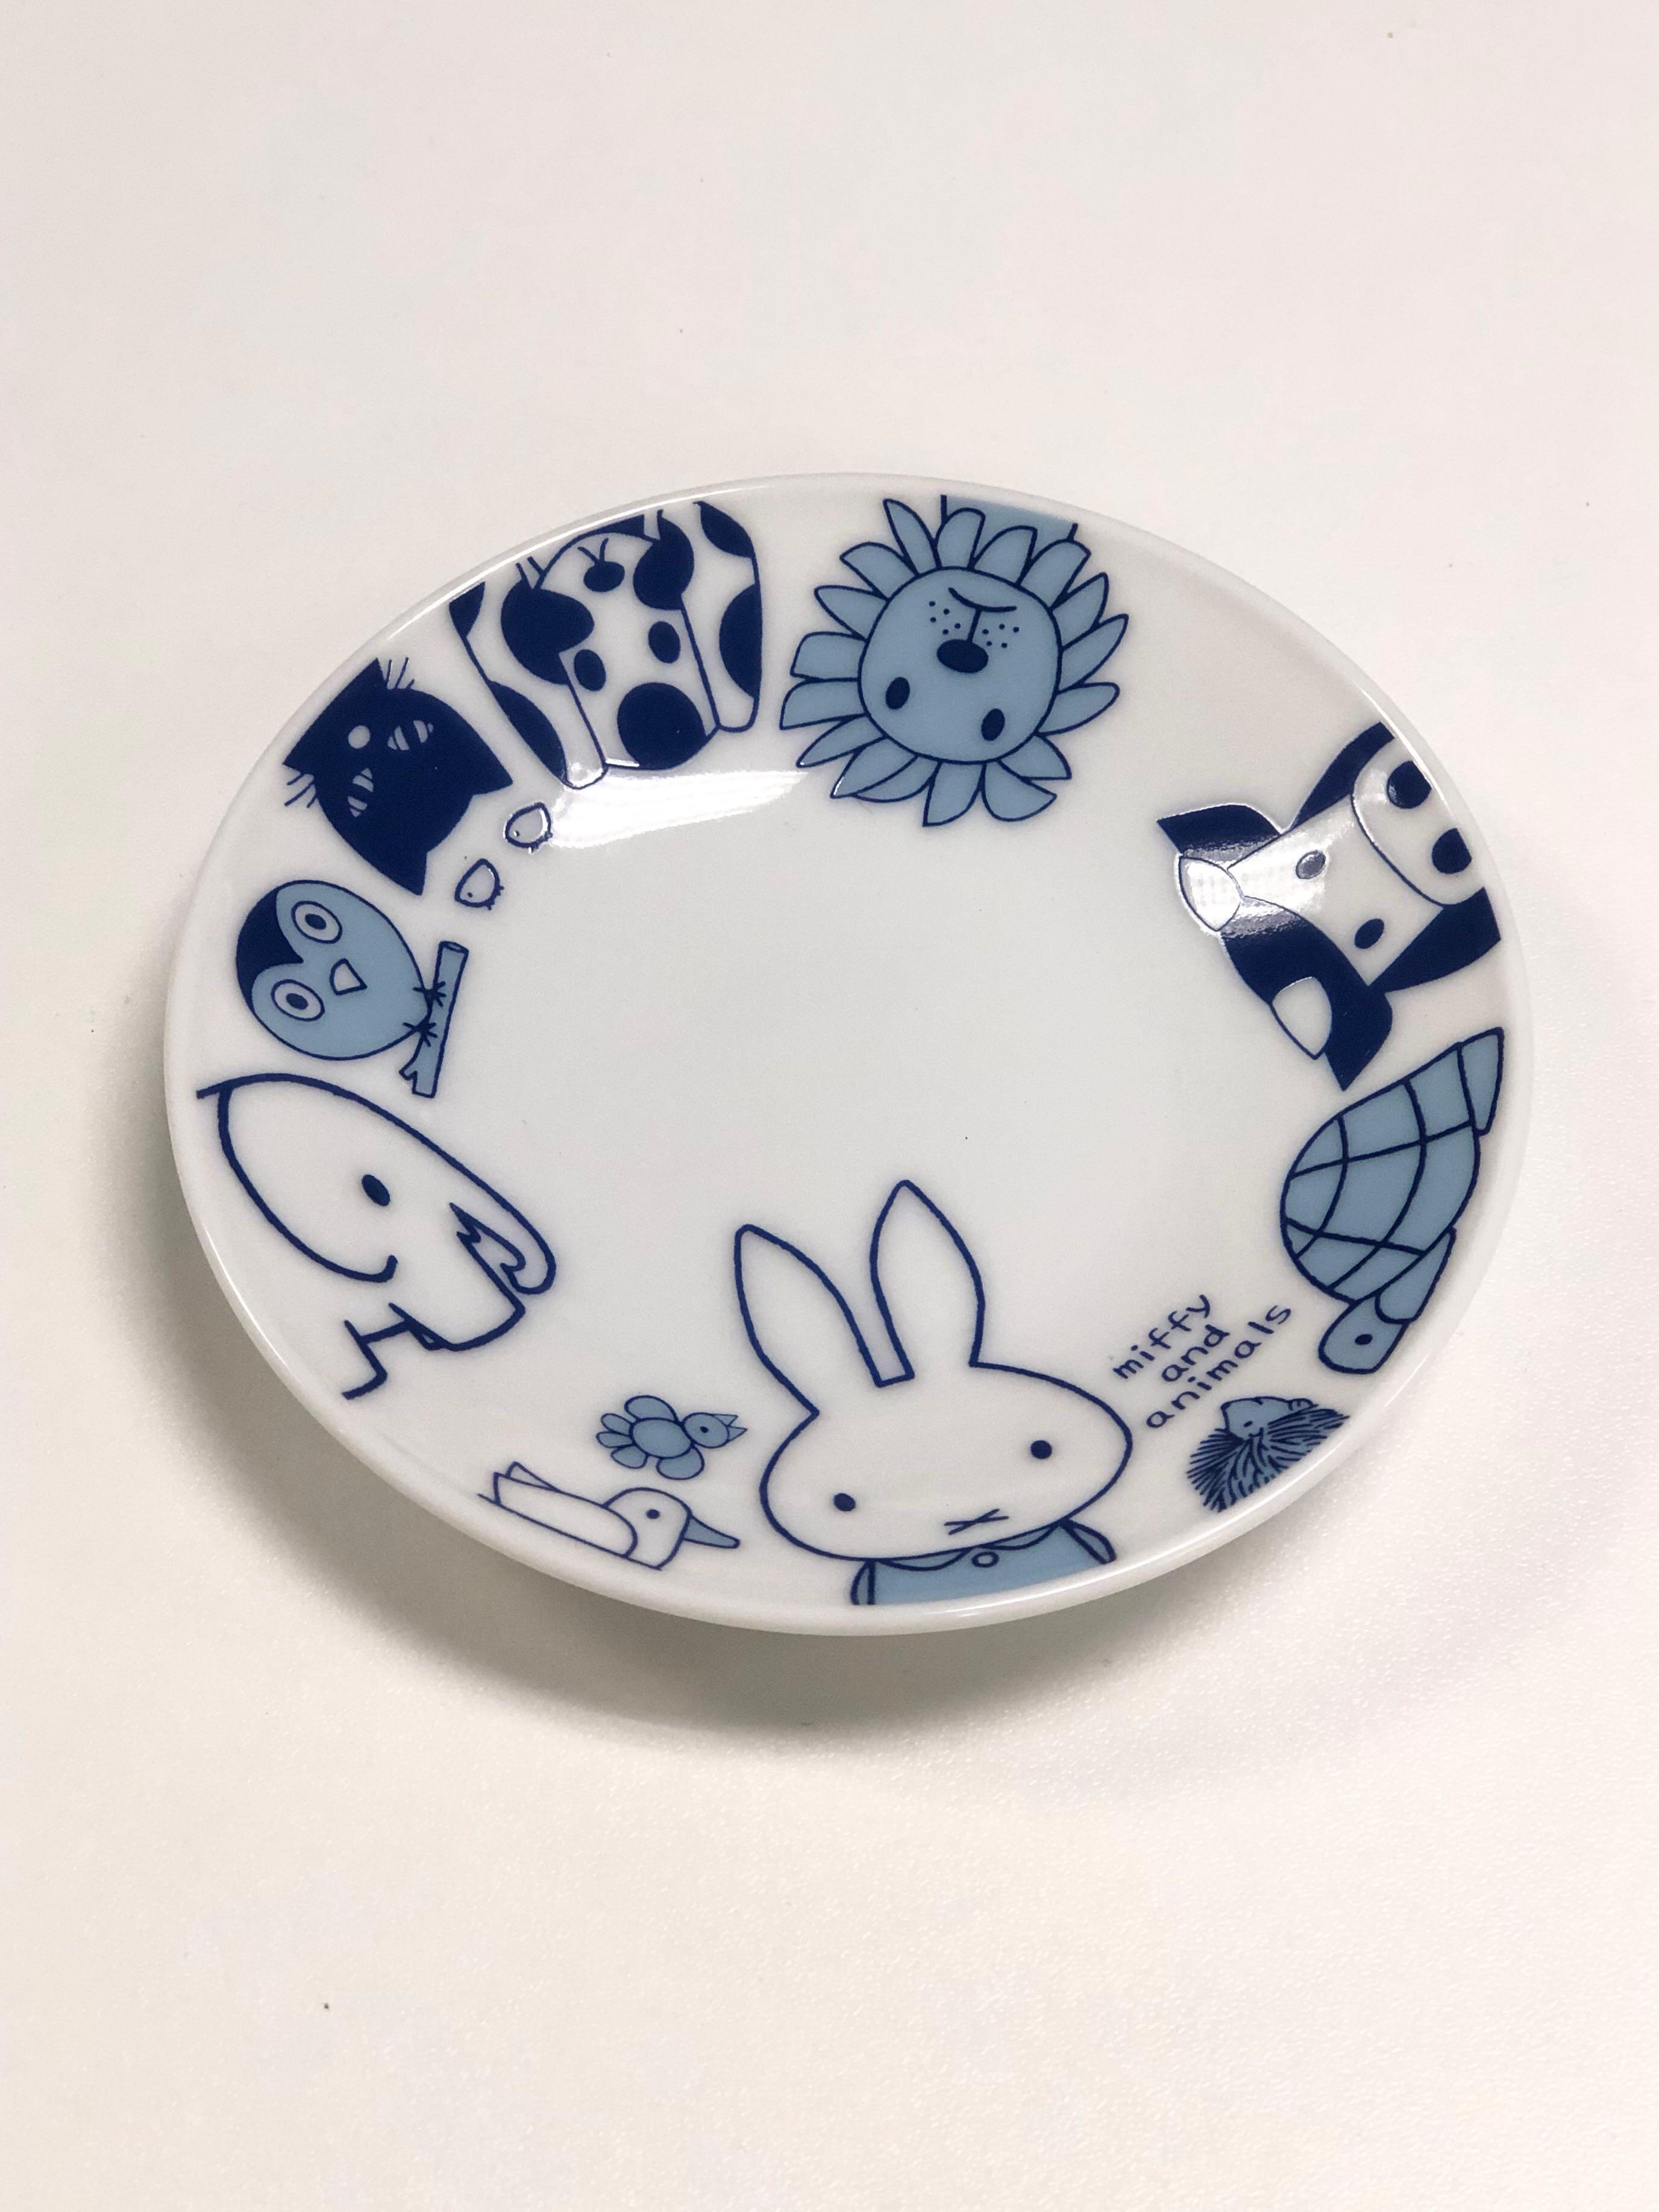 Miffy and Animals 日本製瓷器醬油碟 現貨